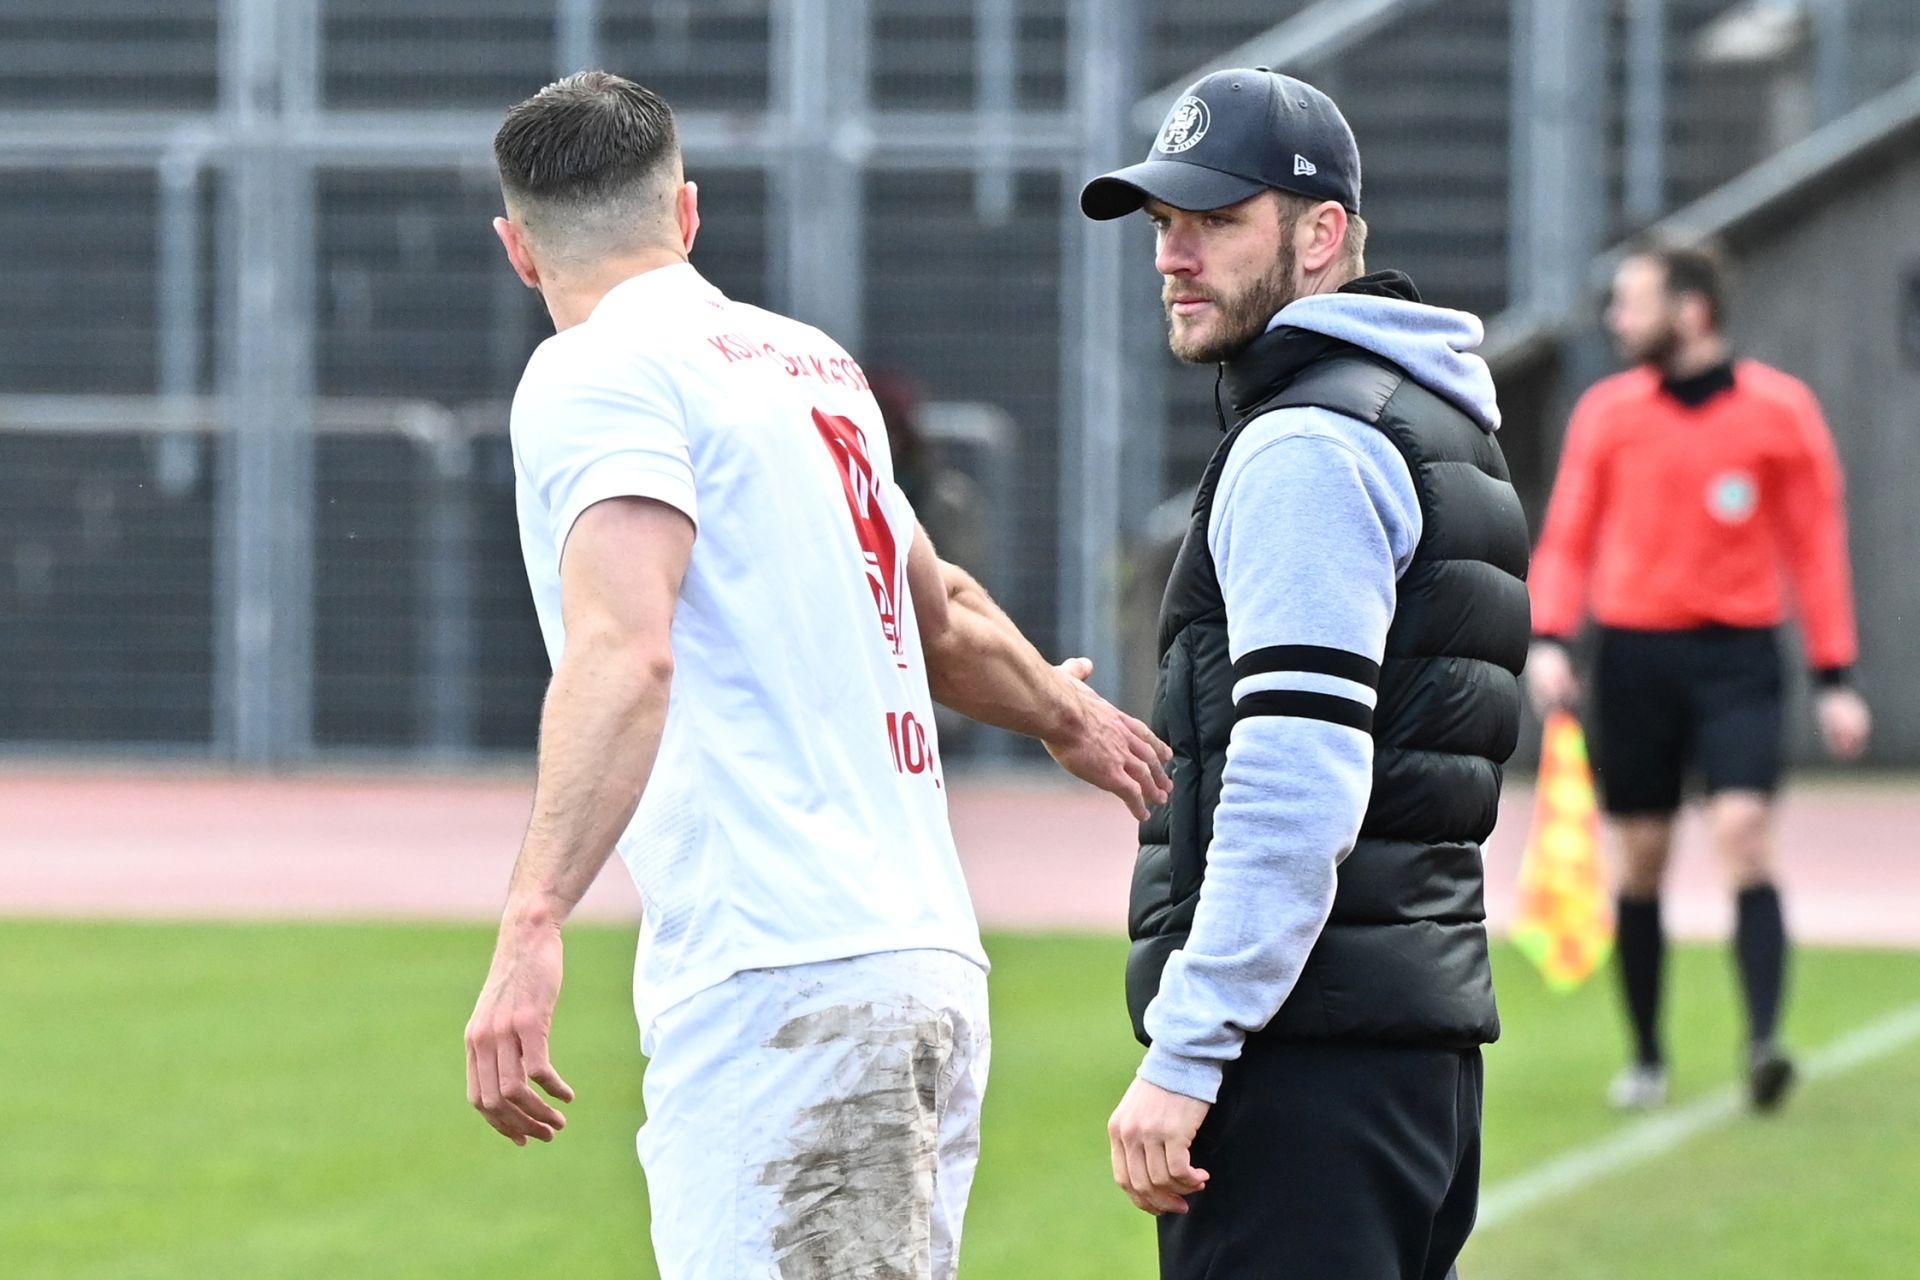 Regionalliga S�dwest 2020/21, KSV Hessen Kassel, FSV Frankfurt, Endstand 2:1